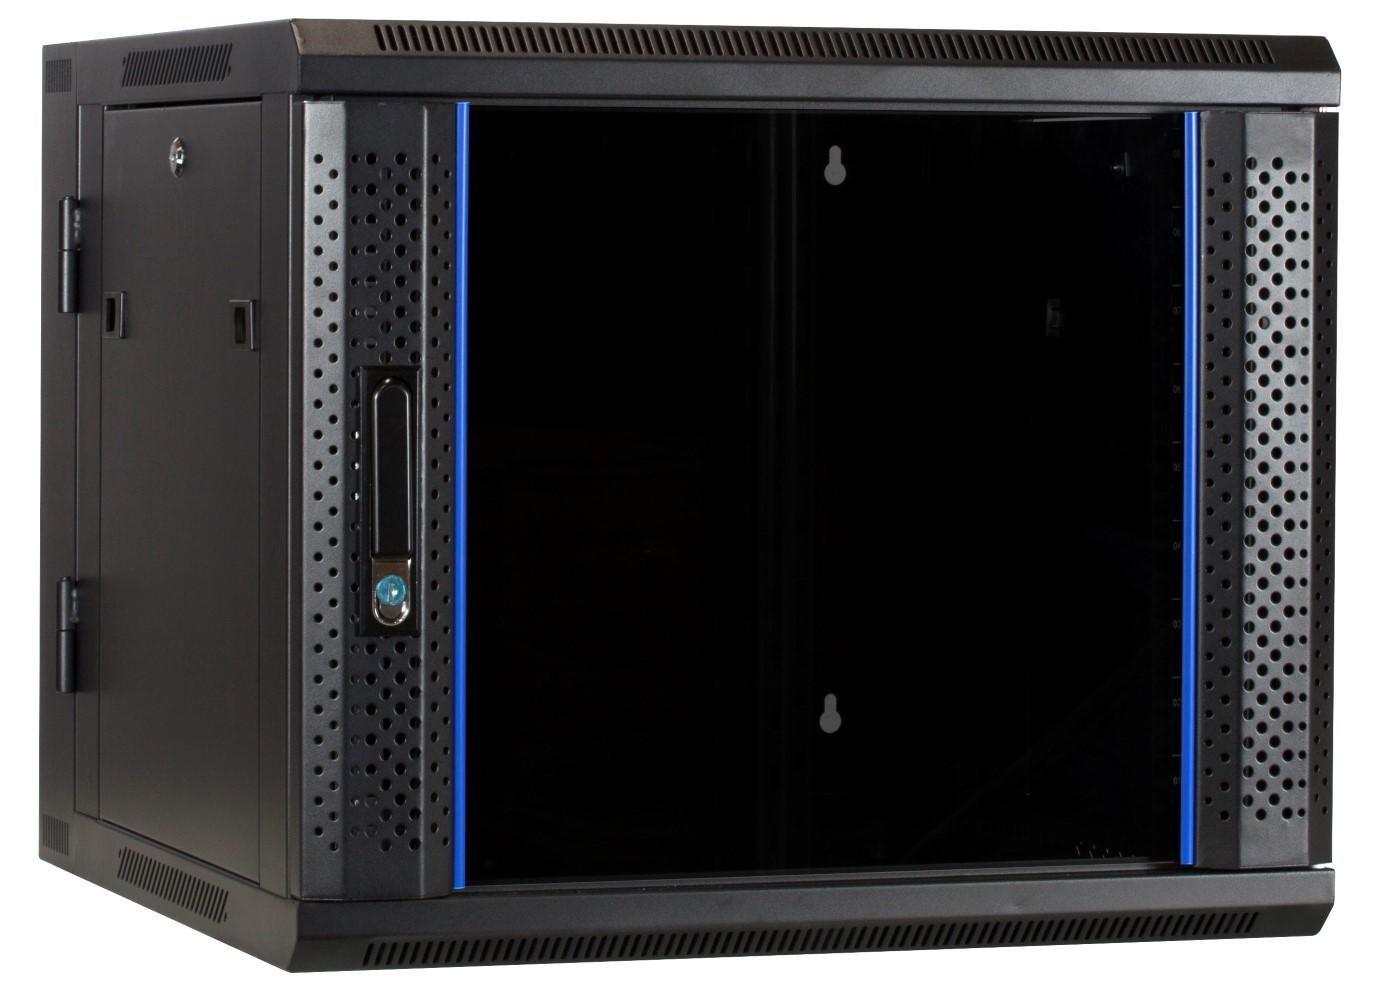 Afbeelding van 9U wandkast - kantelbaar met glazen deur 600x600x500mm